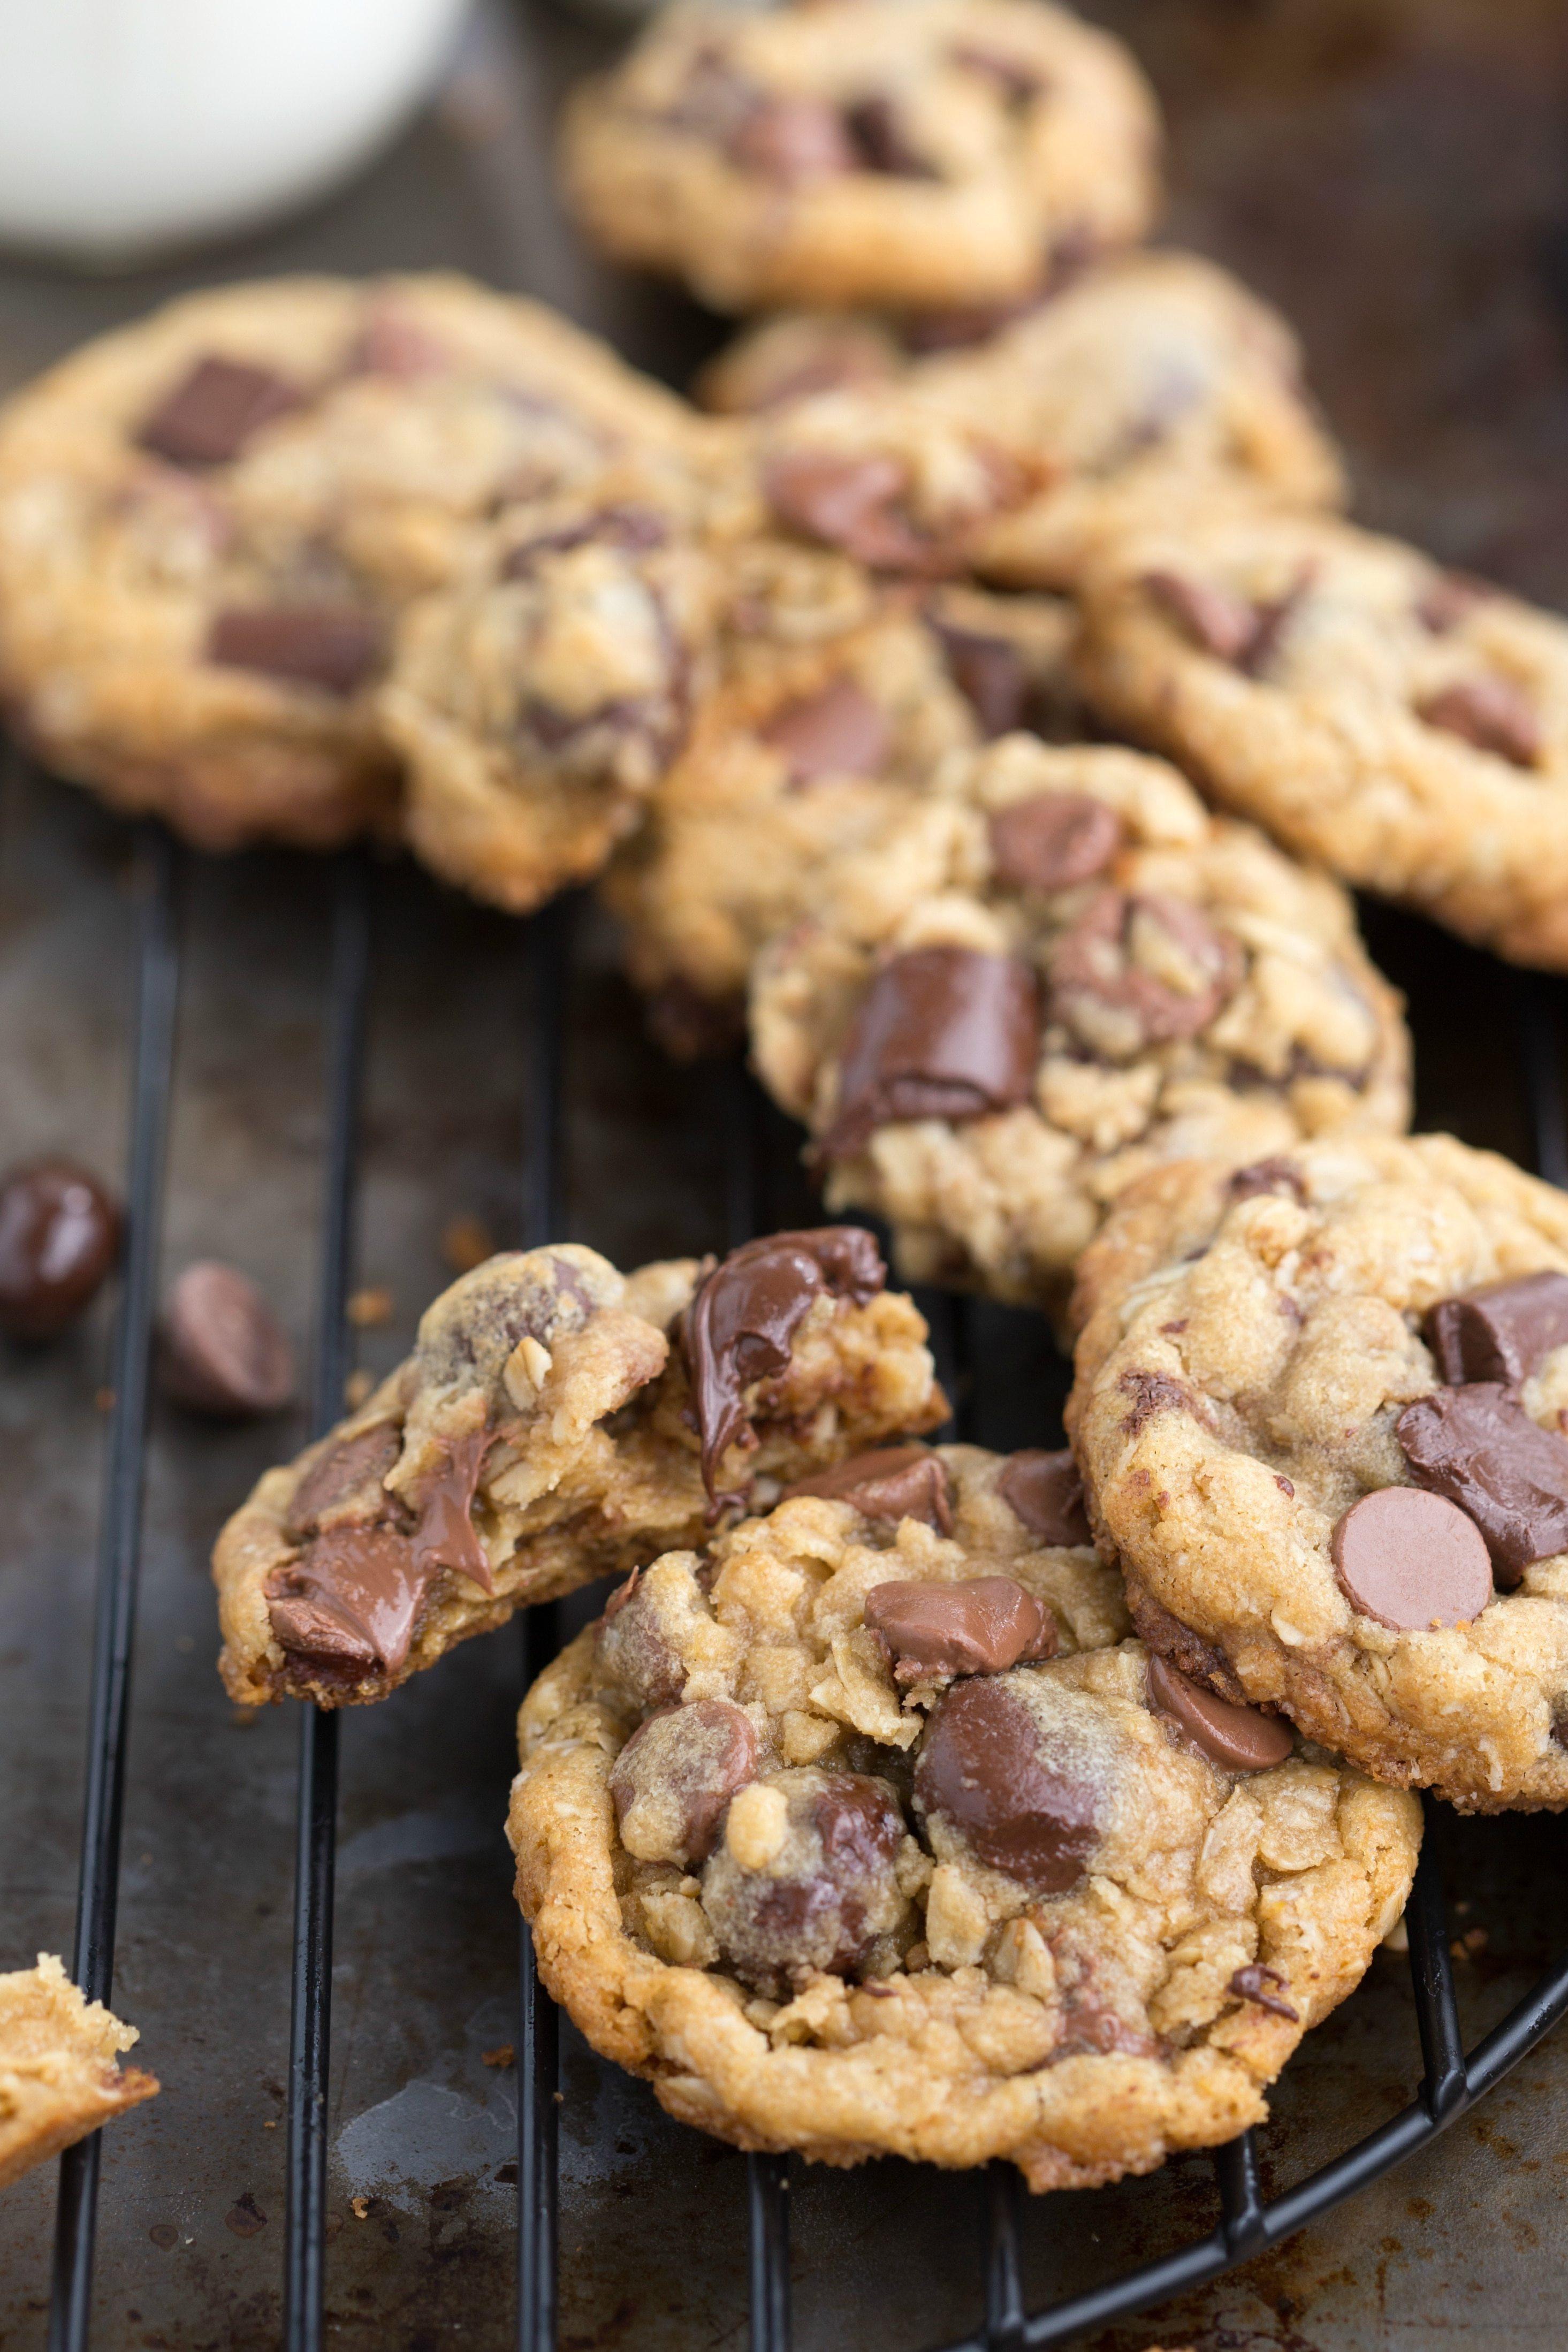 Oat Chocolate Chip Cookies Healthy  Healthier Oatmeal Chocolate Chip Cookies with Dark